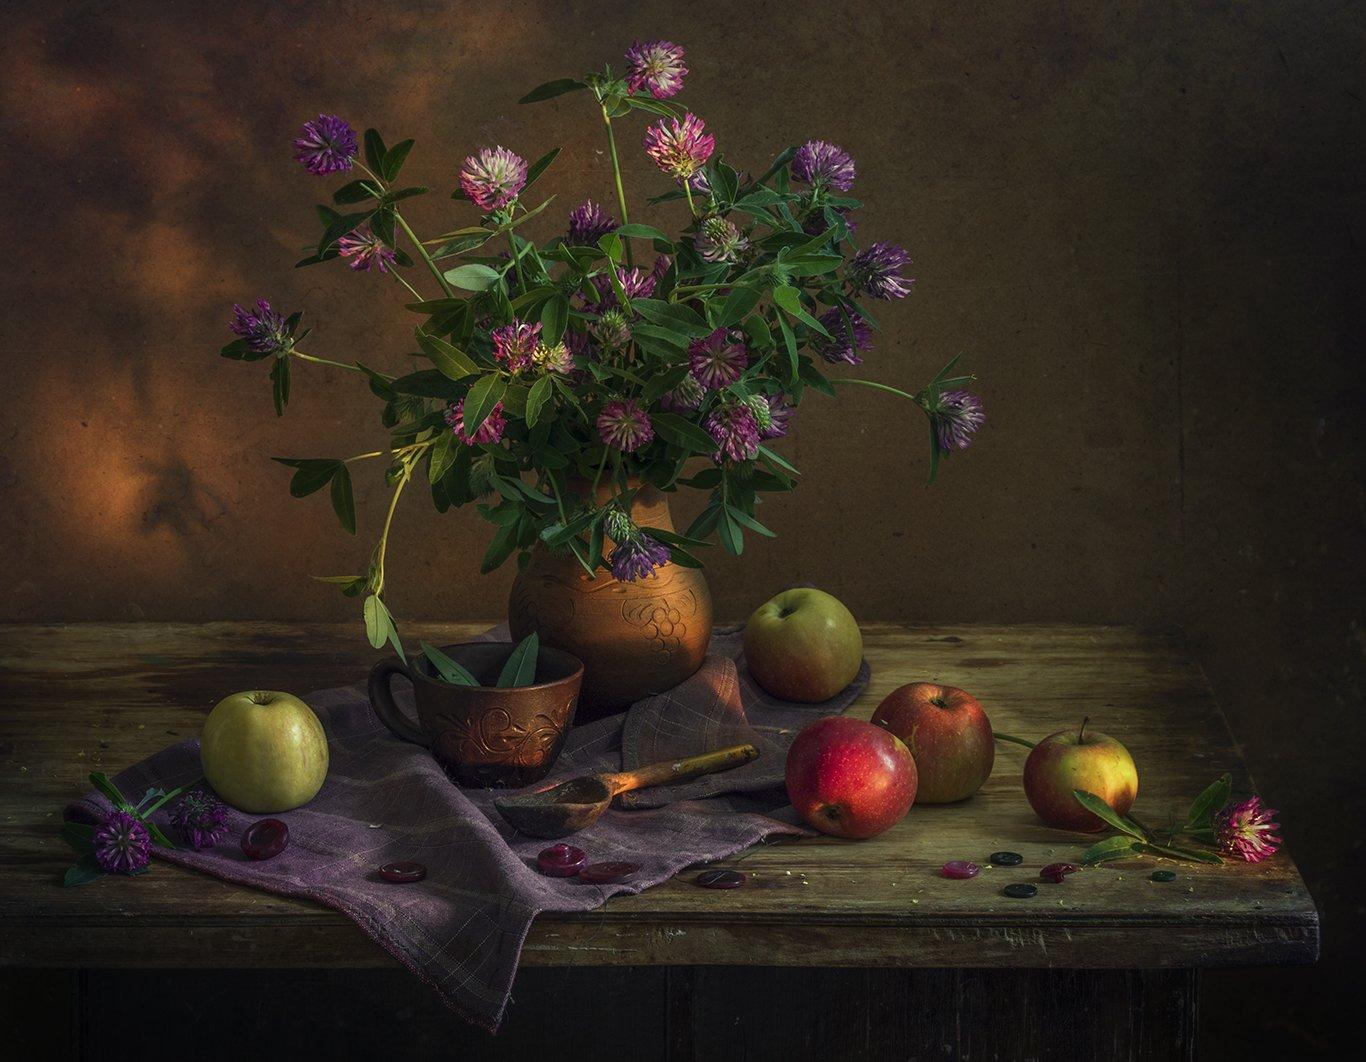 натюрморт,лето,яблоки,клевер, Елена Рубинская